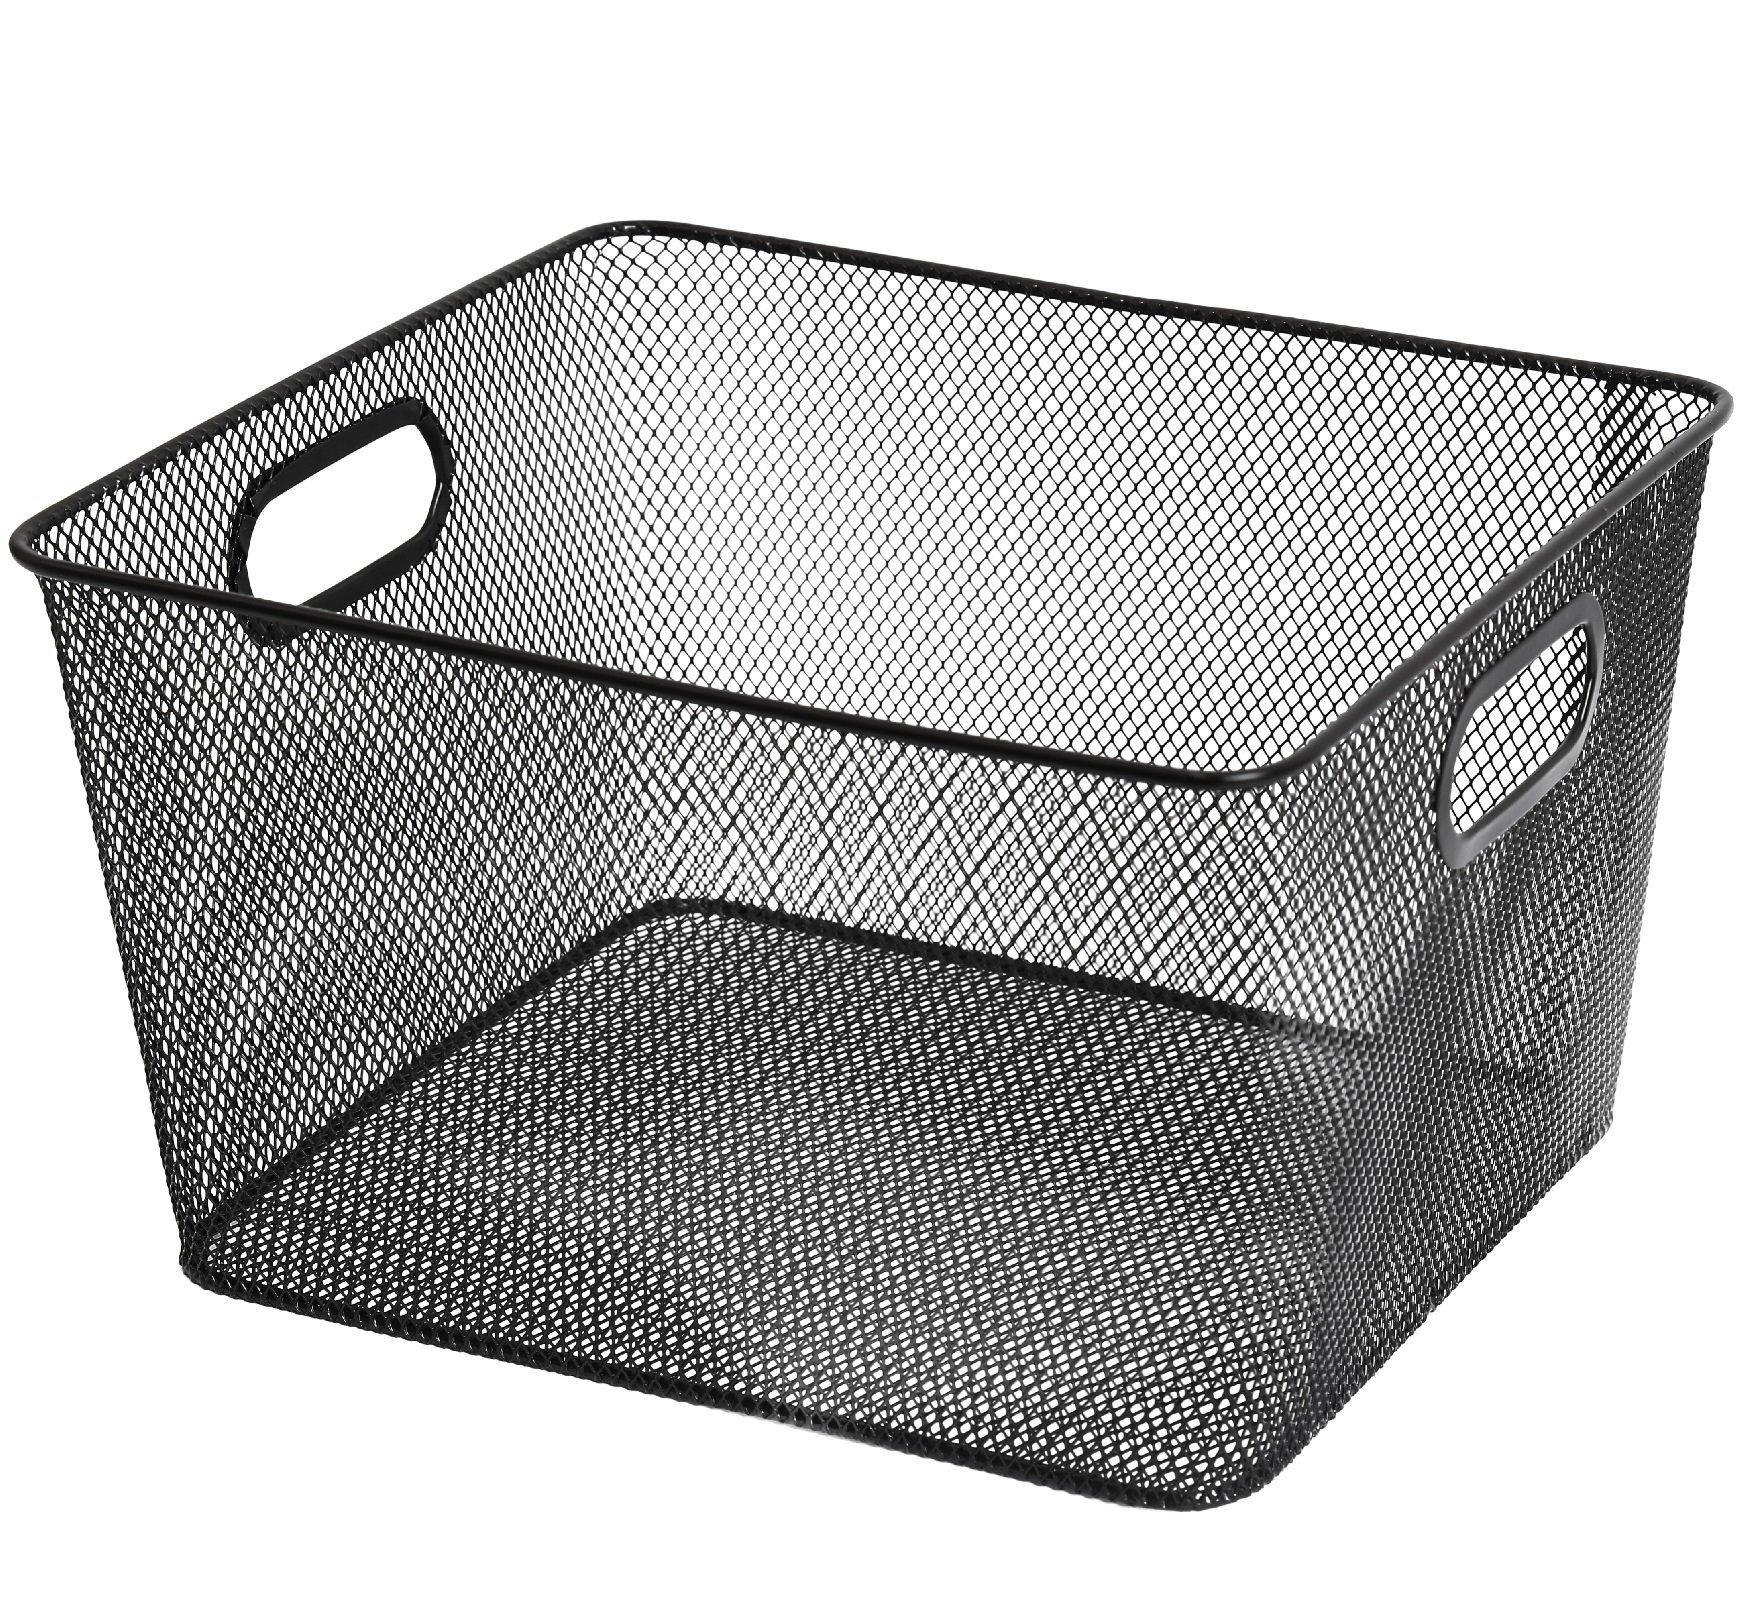 Mesh Open Bin Storage Basket Organizer for Fruits, Vegetables, Pantry Items Toys 2041 (1, 10 X 8.8 X 5.8)